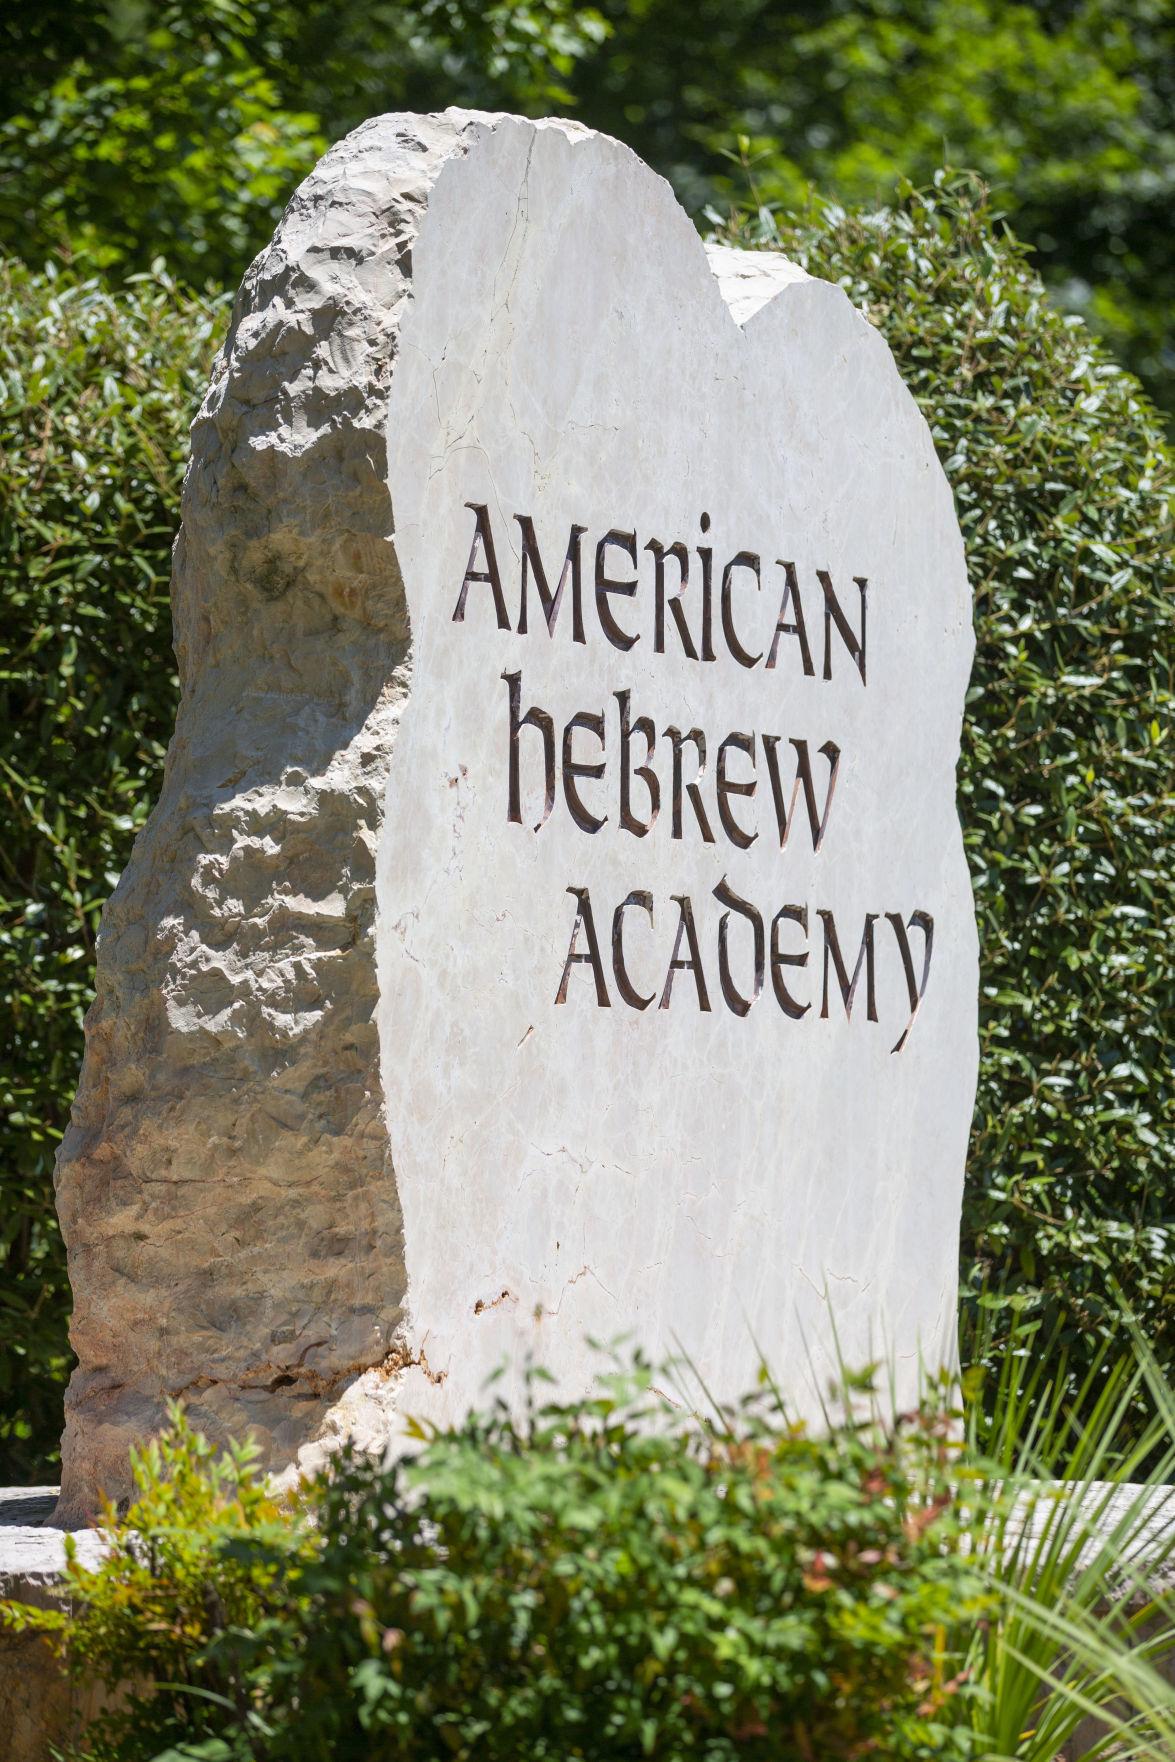 American Hebrew Academy (horizontal)